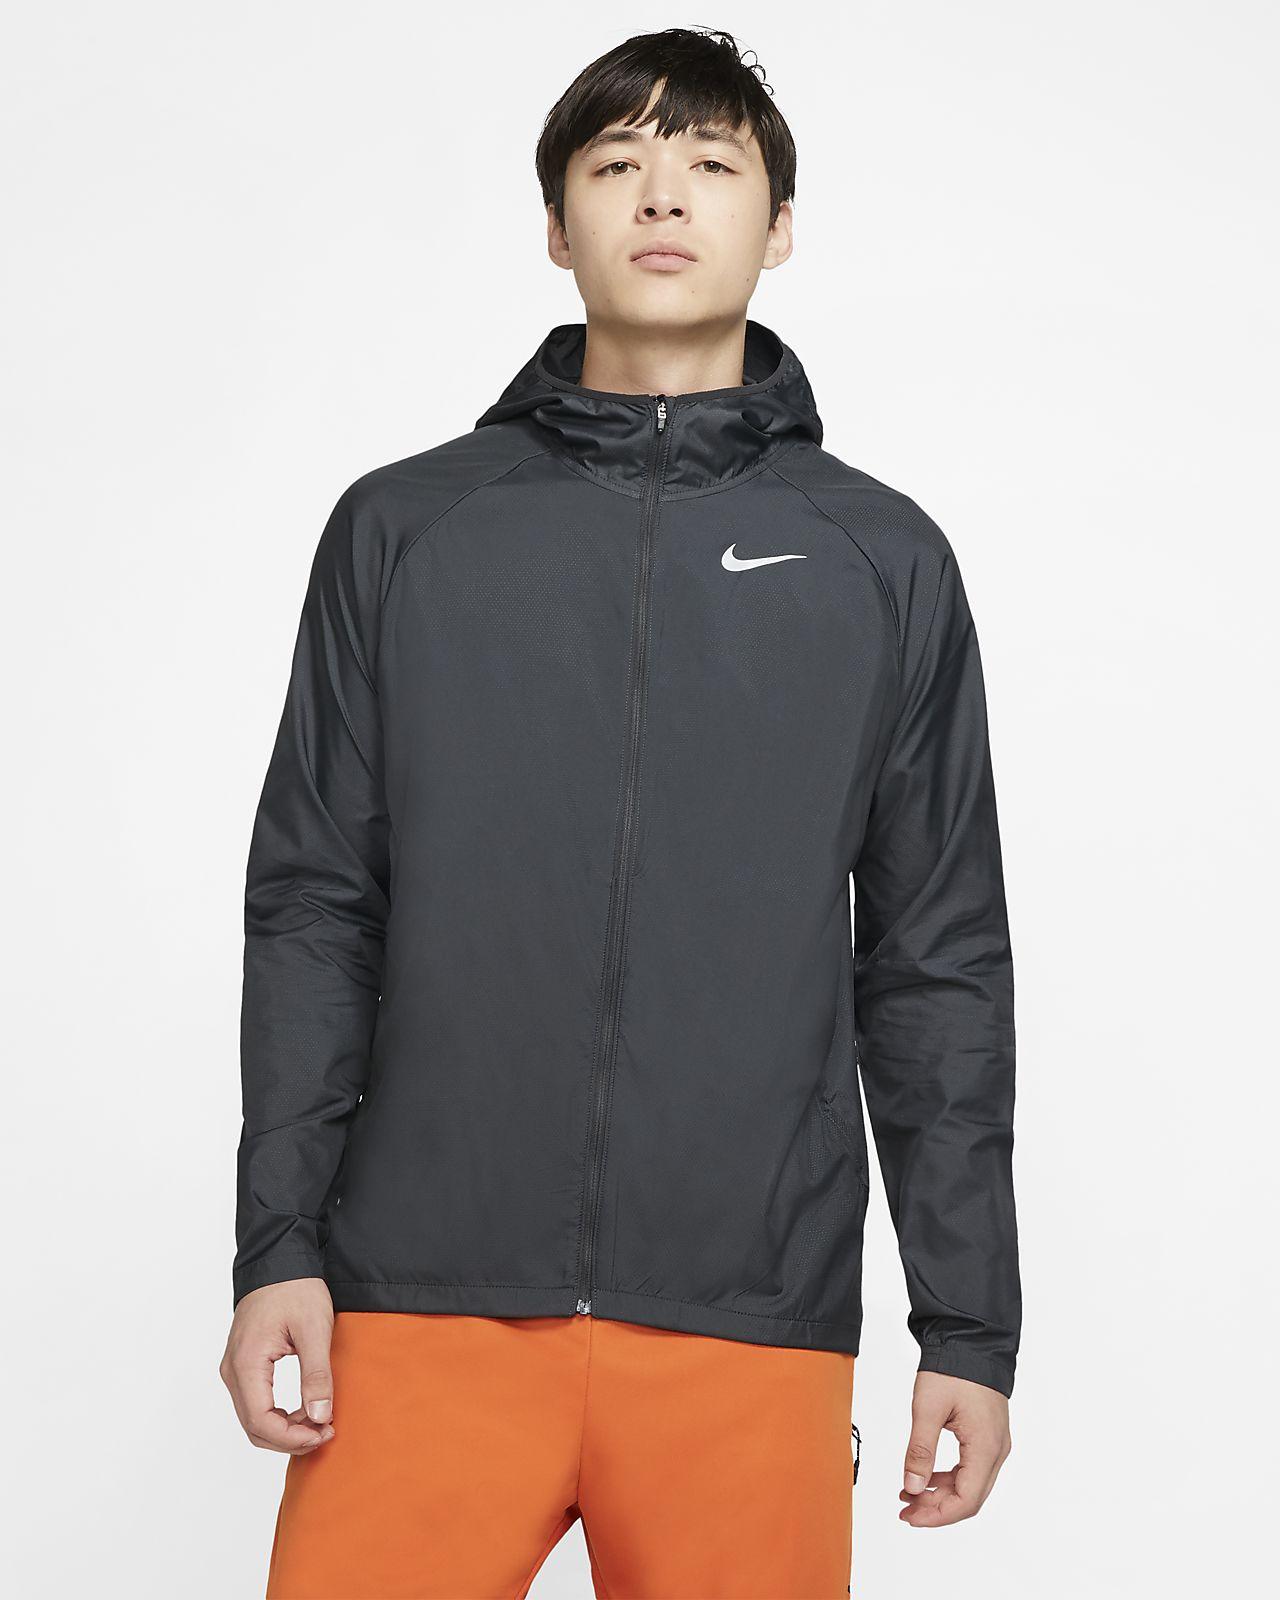 Chamarra de running con capucha para hombre Nike Essential